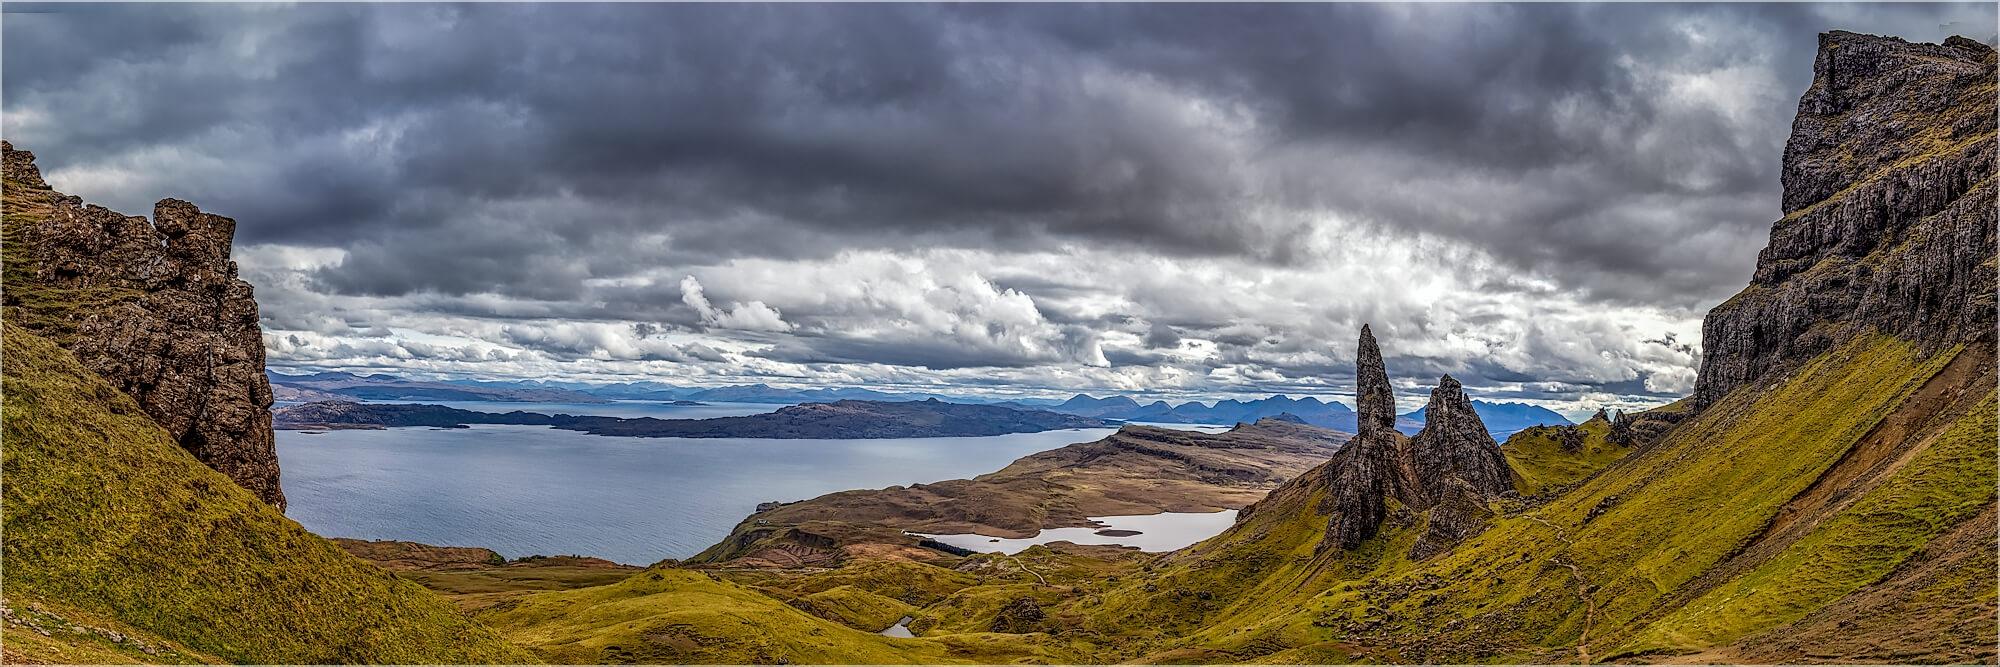 Panoramabild Isle of  Skye old man of Storr Schottland